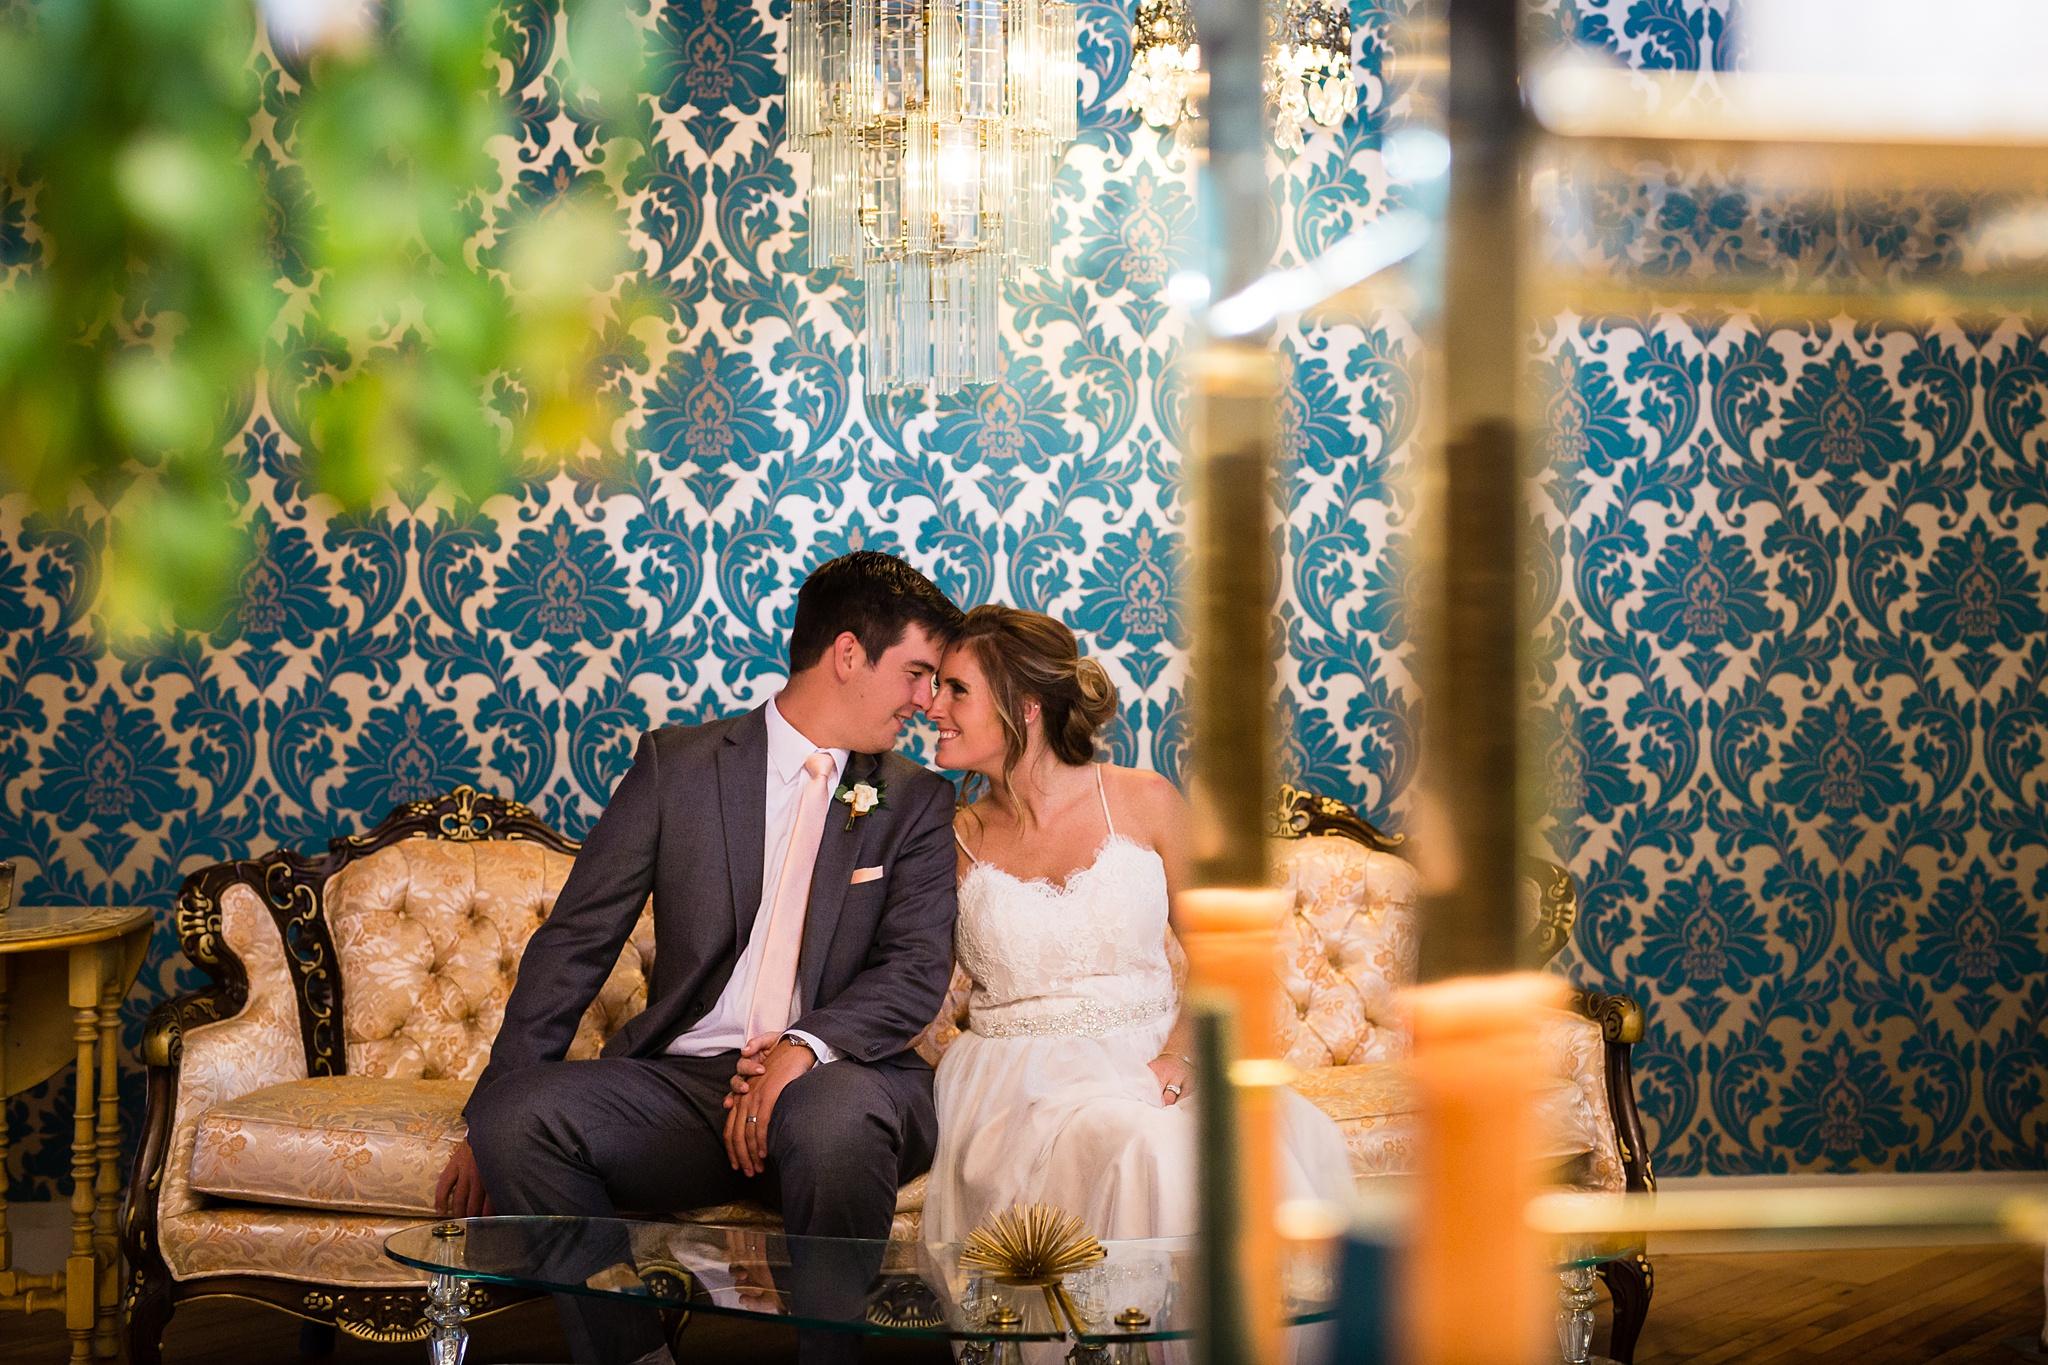 Meghan_Drew_Grand_Rapids_Cheney_place_Wedding093.JPG